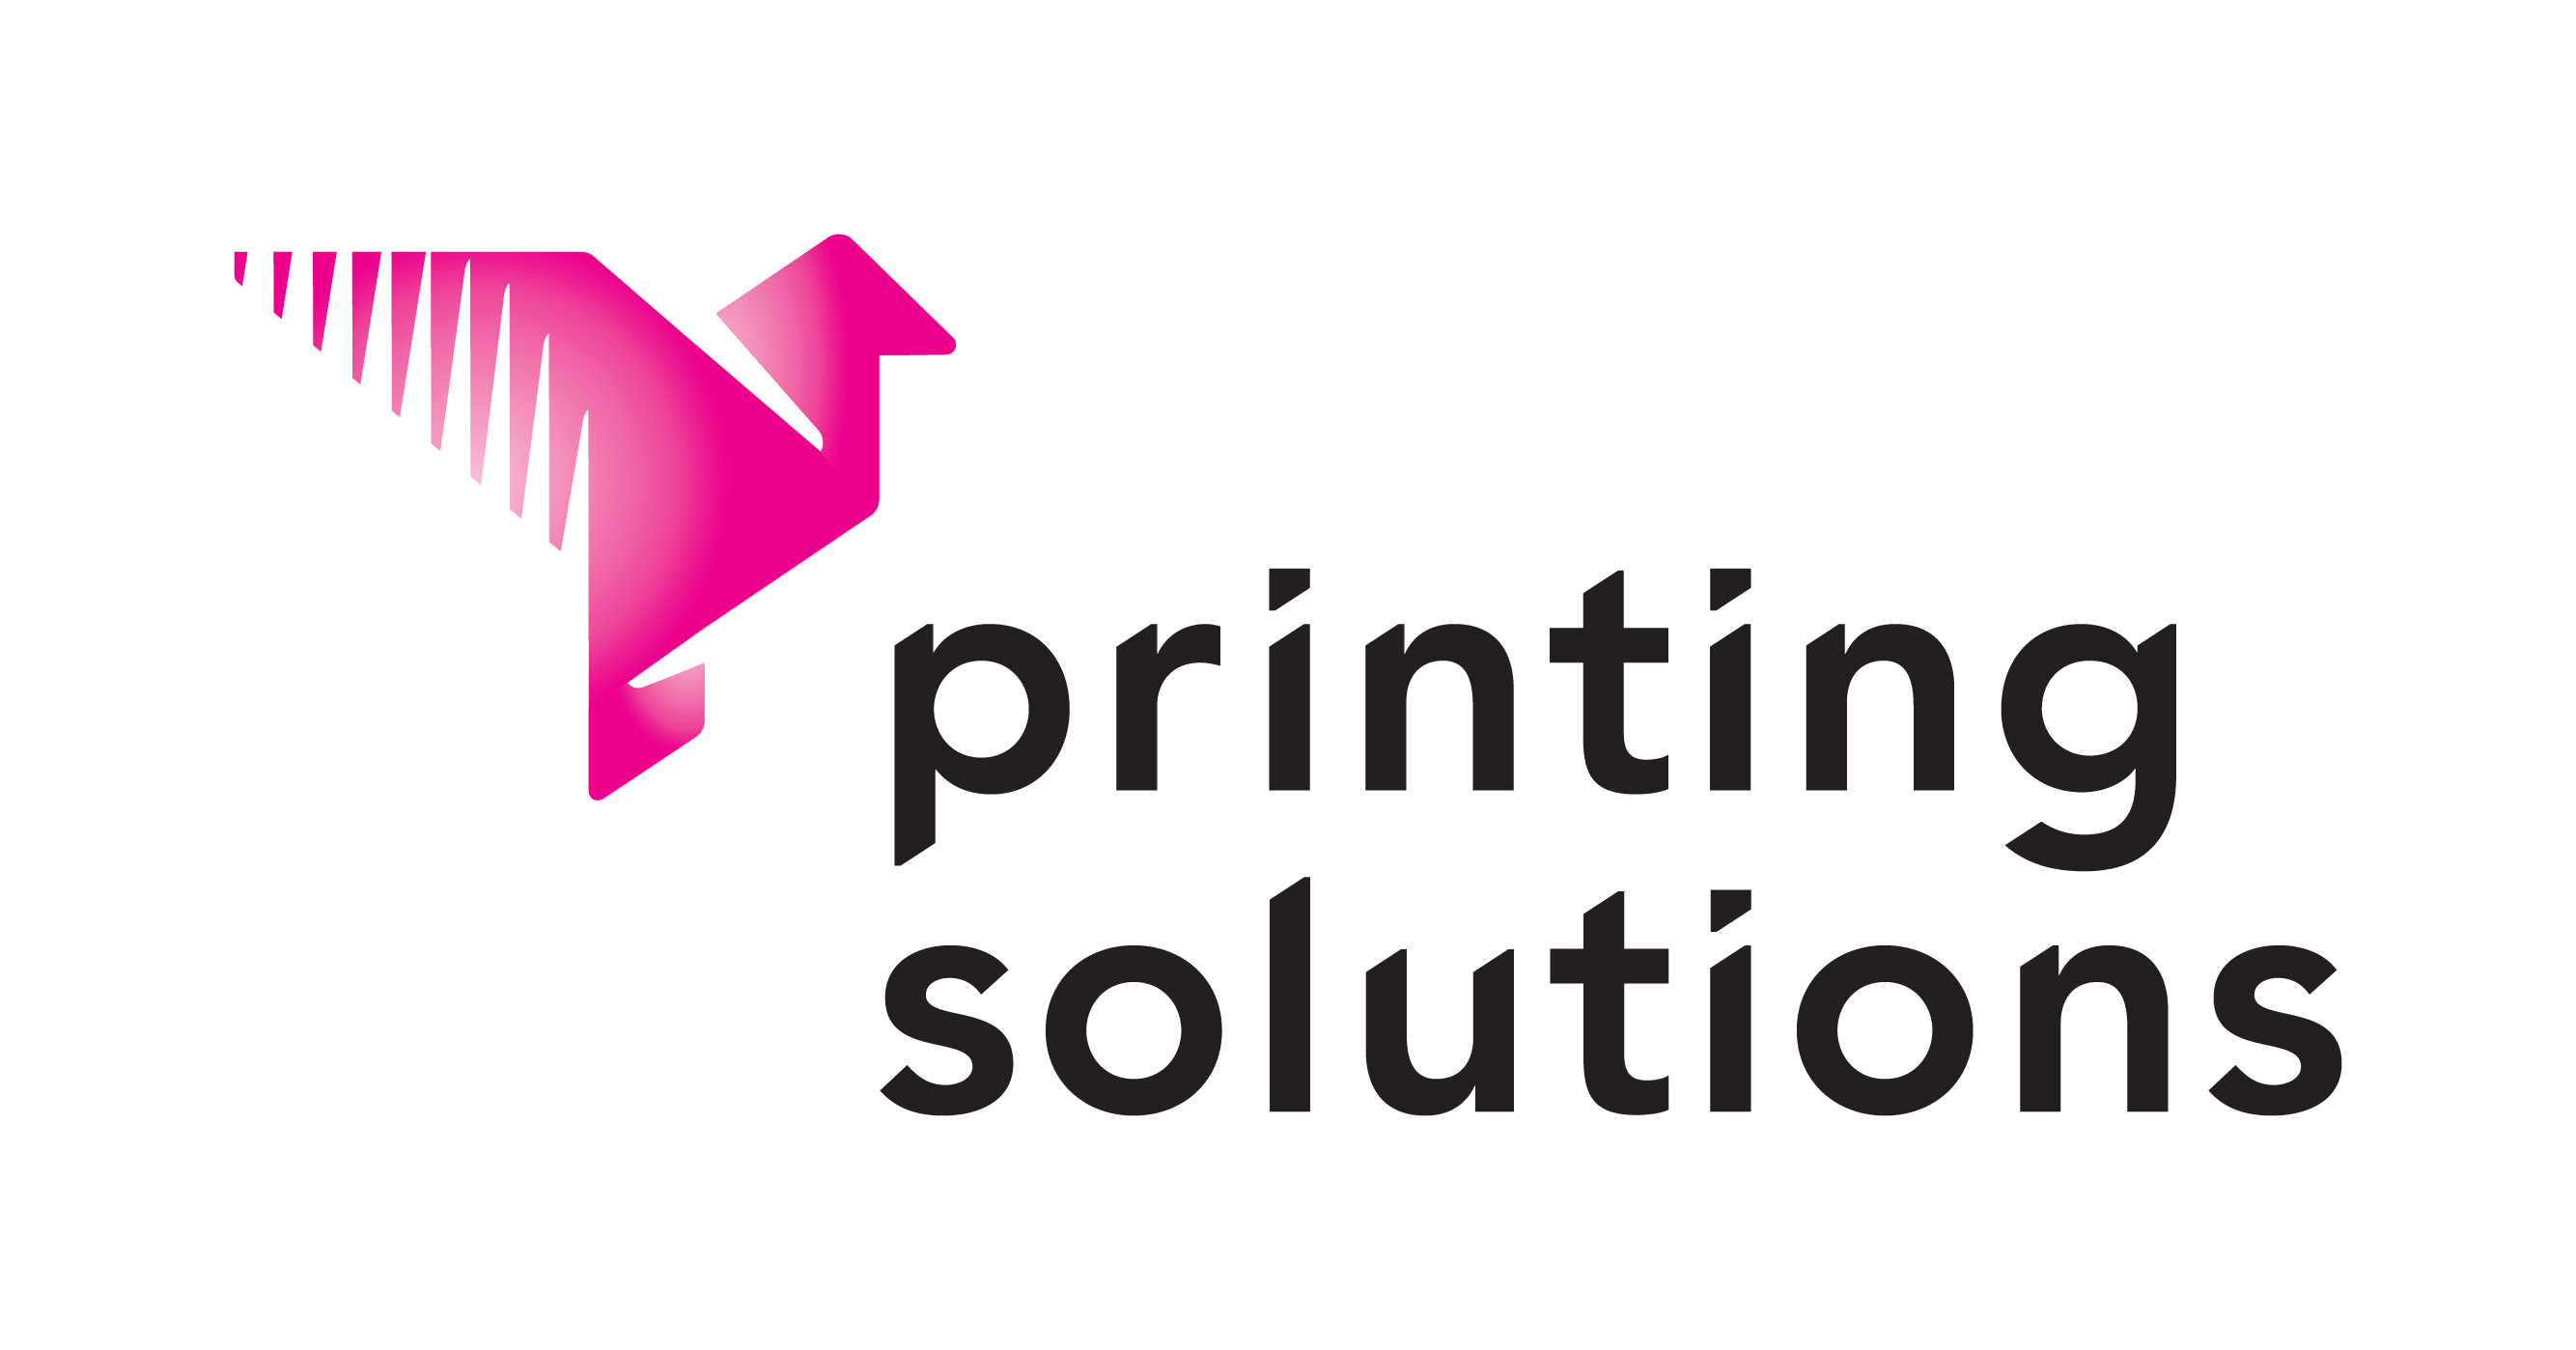 printing-solutions-origami-bird-logo